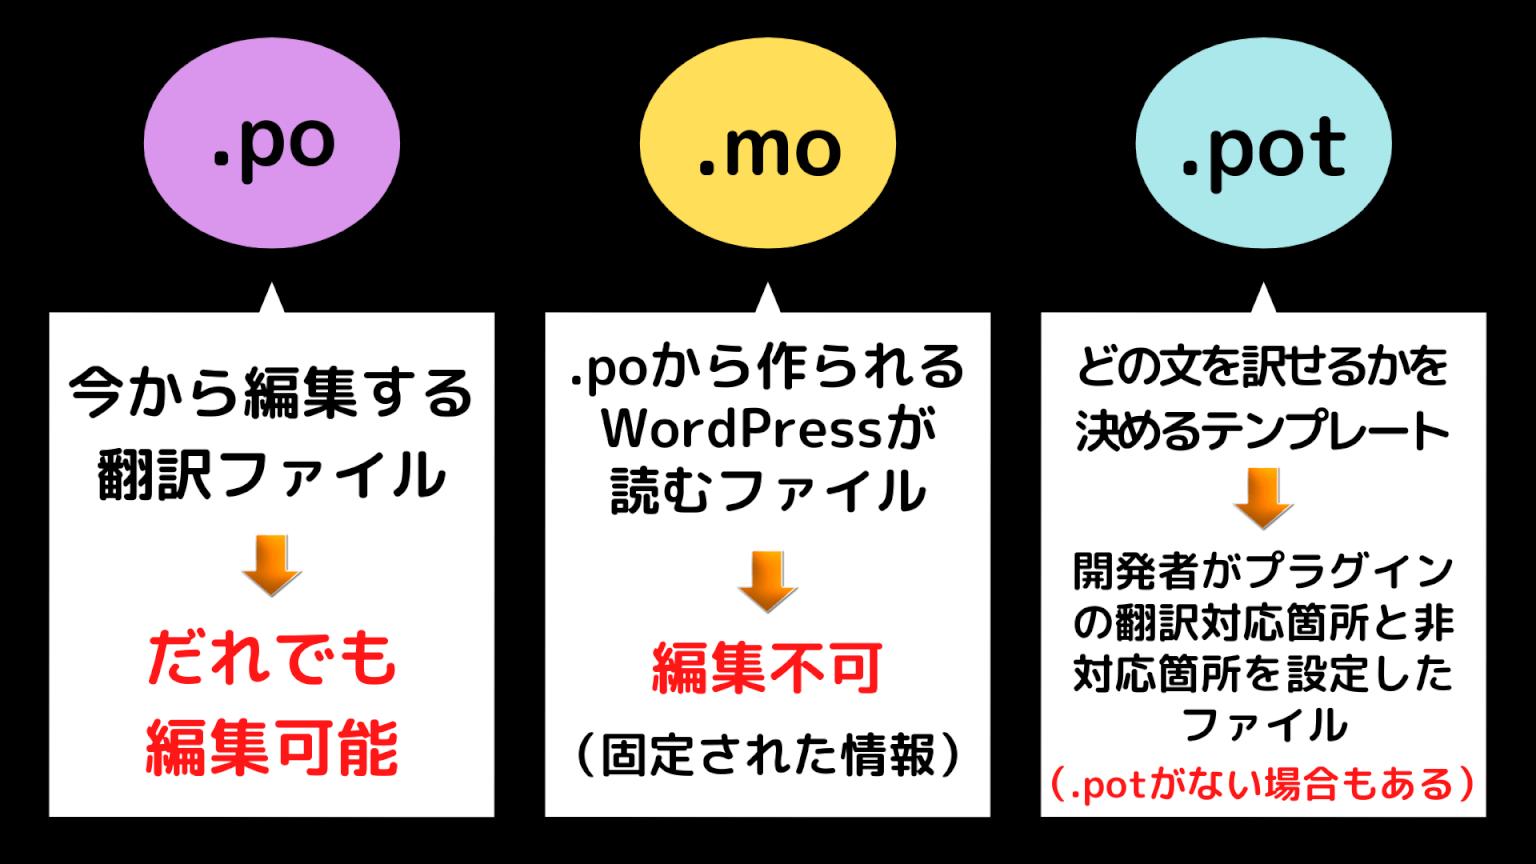 .po / .mo / .pot それぞれの都外と特性の説明